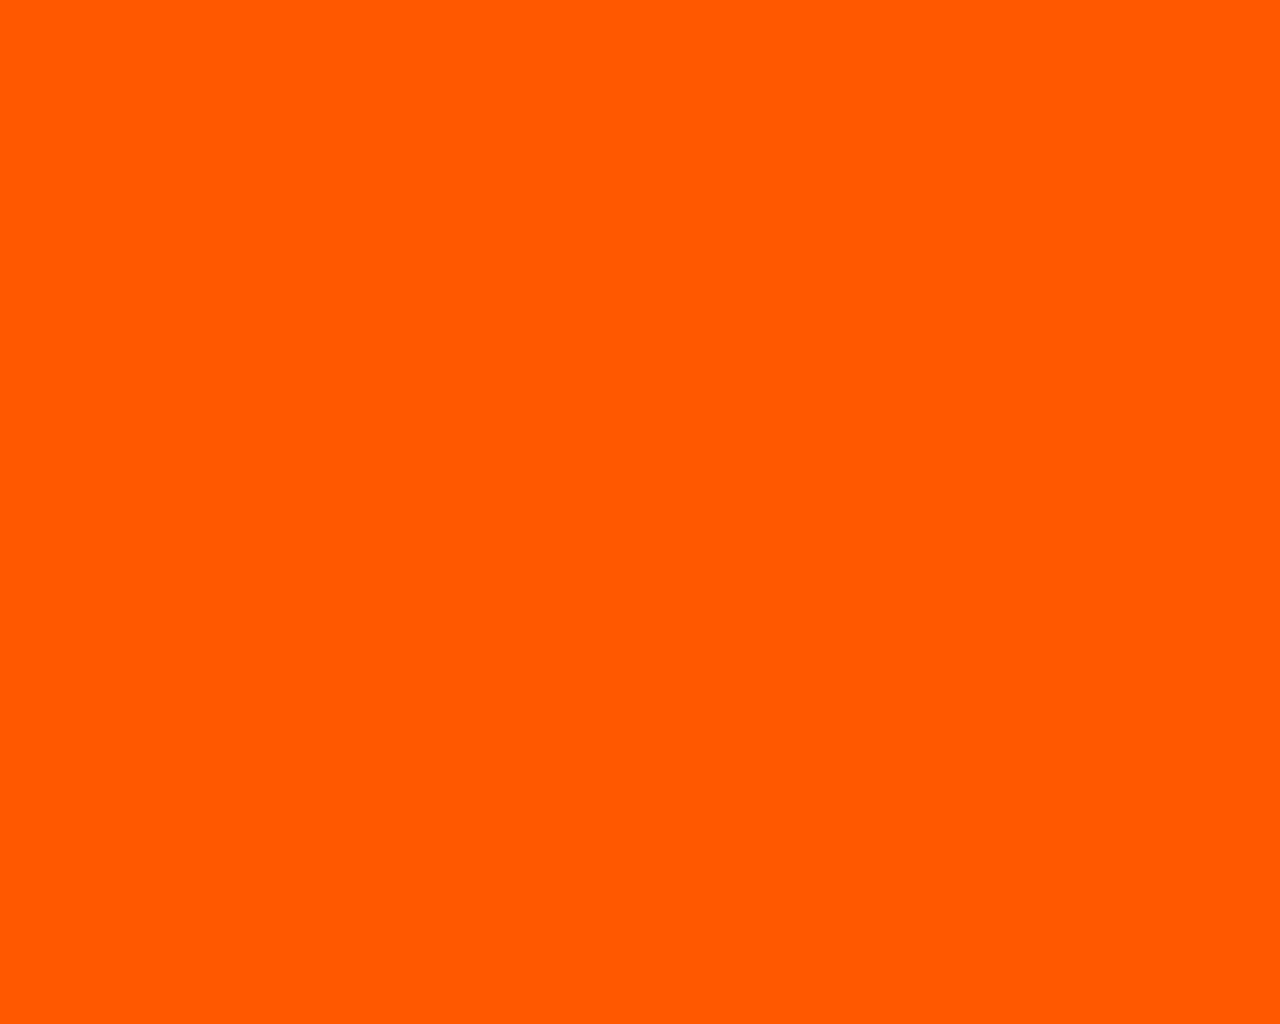 1280x1024 Orange Pantone Solid Color Background